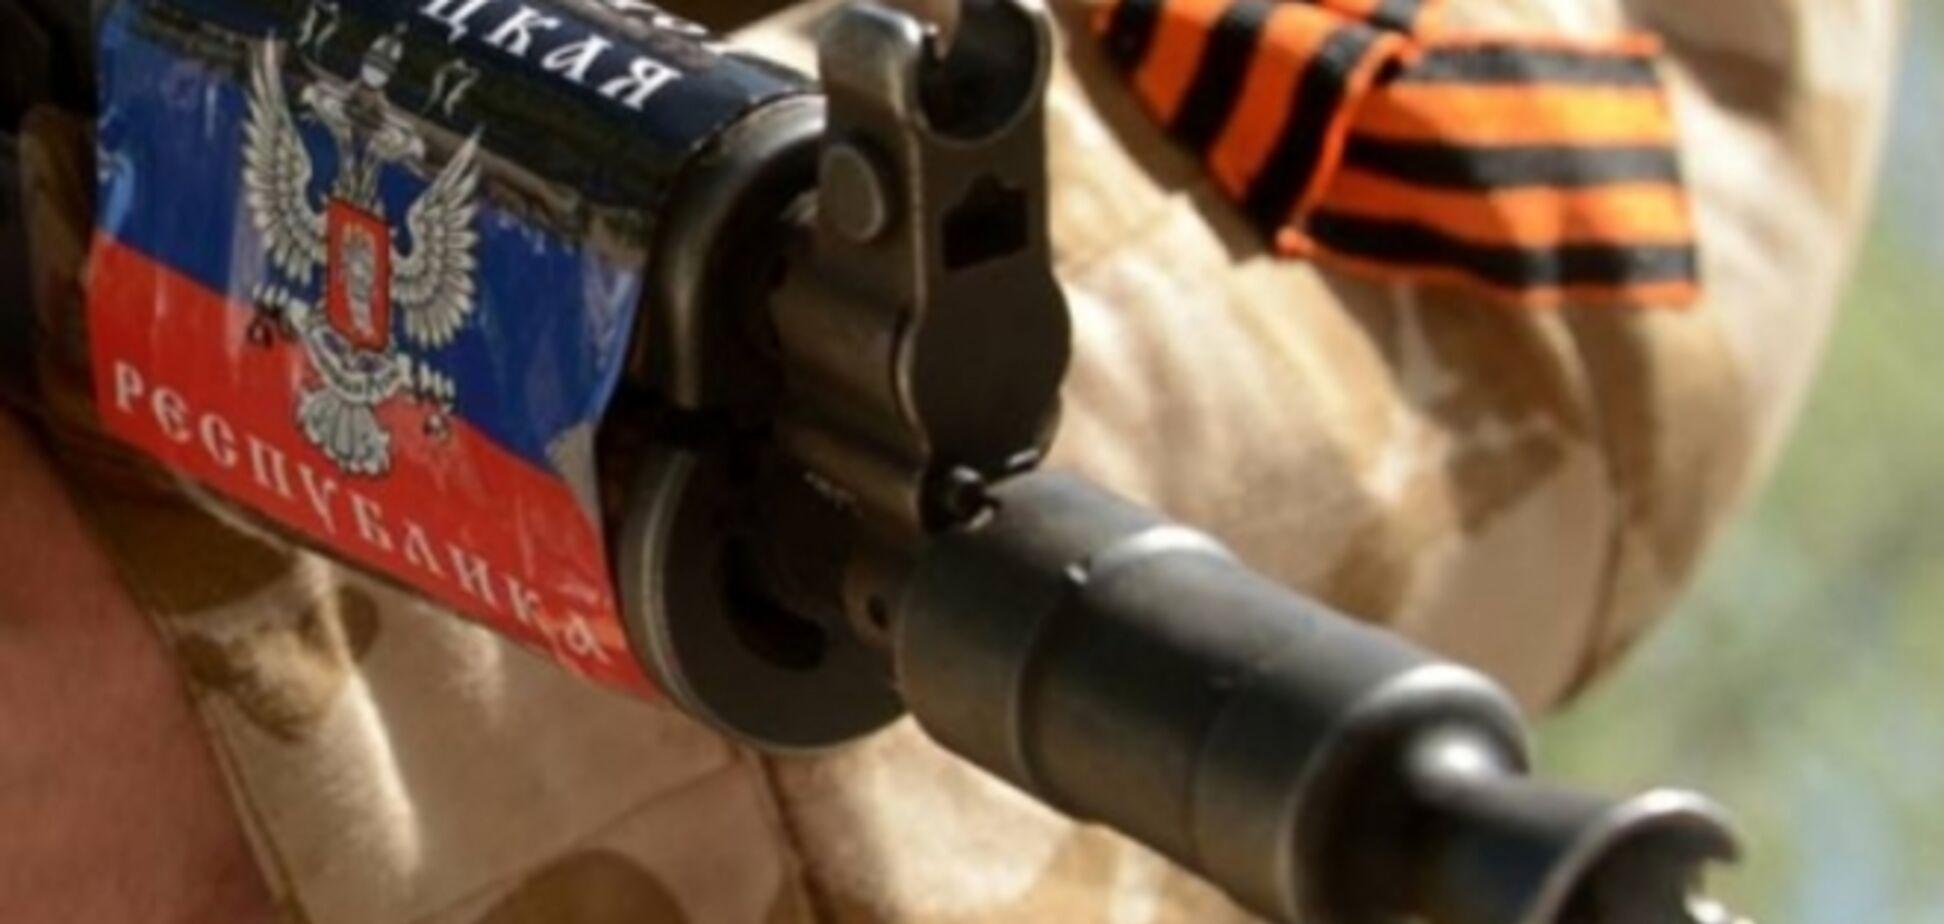 В Рубежном пойман террорист 'Хазбул' из банды 'Призрак'